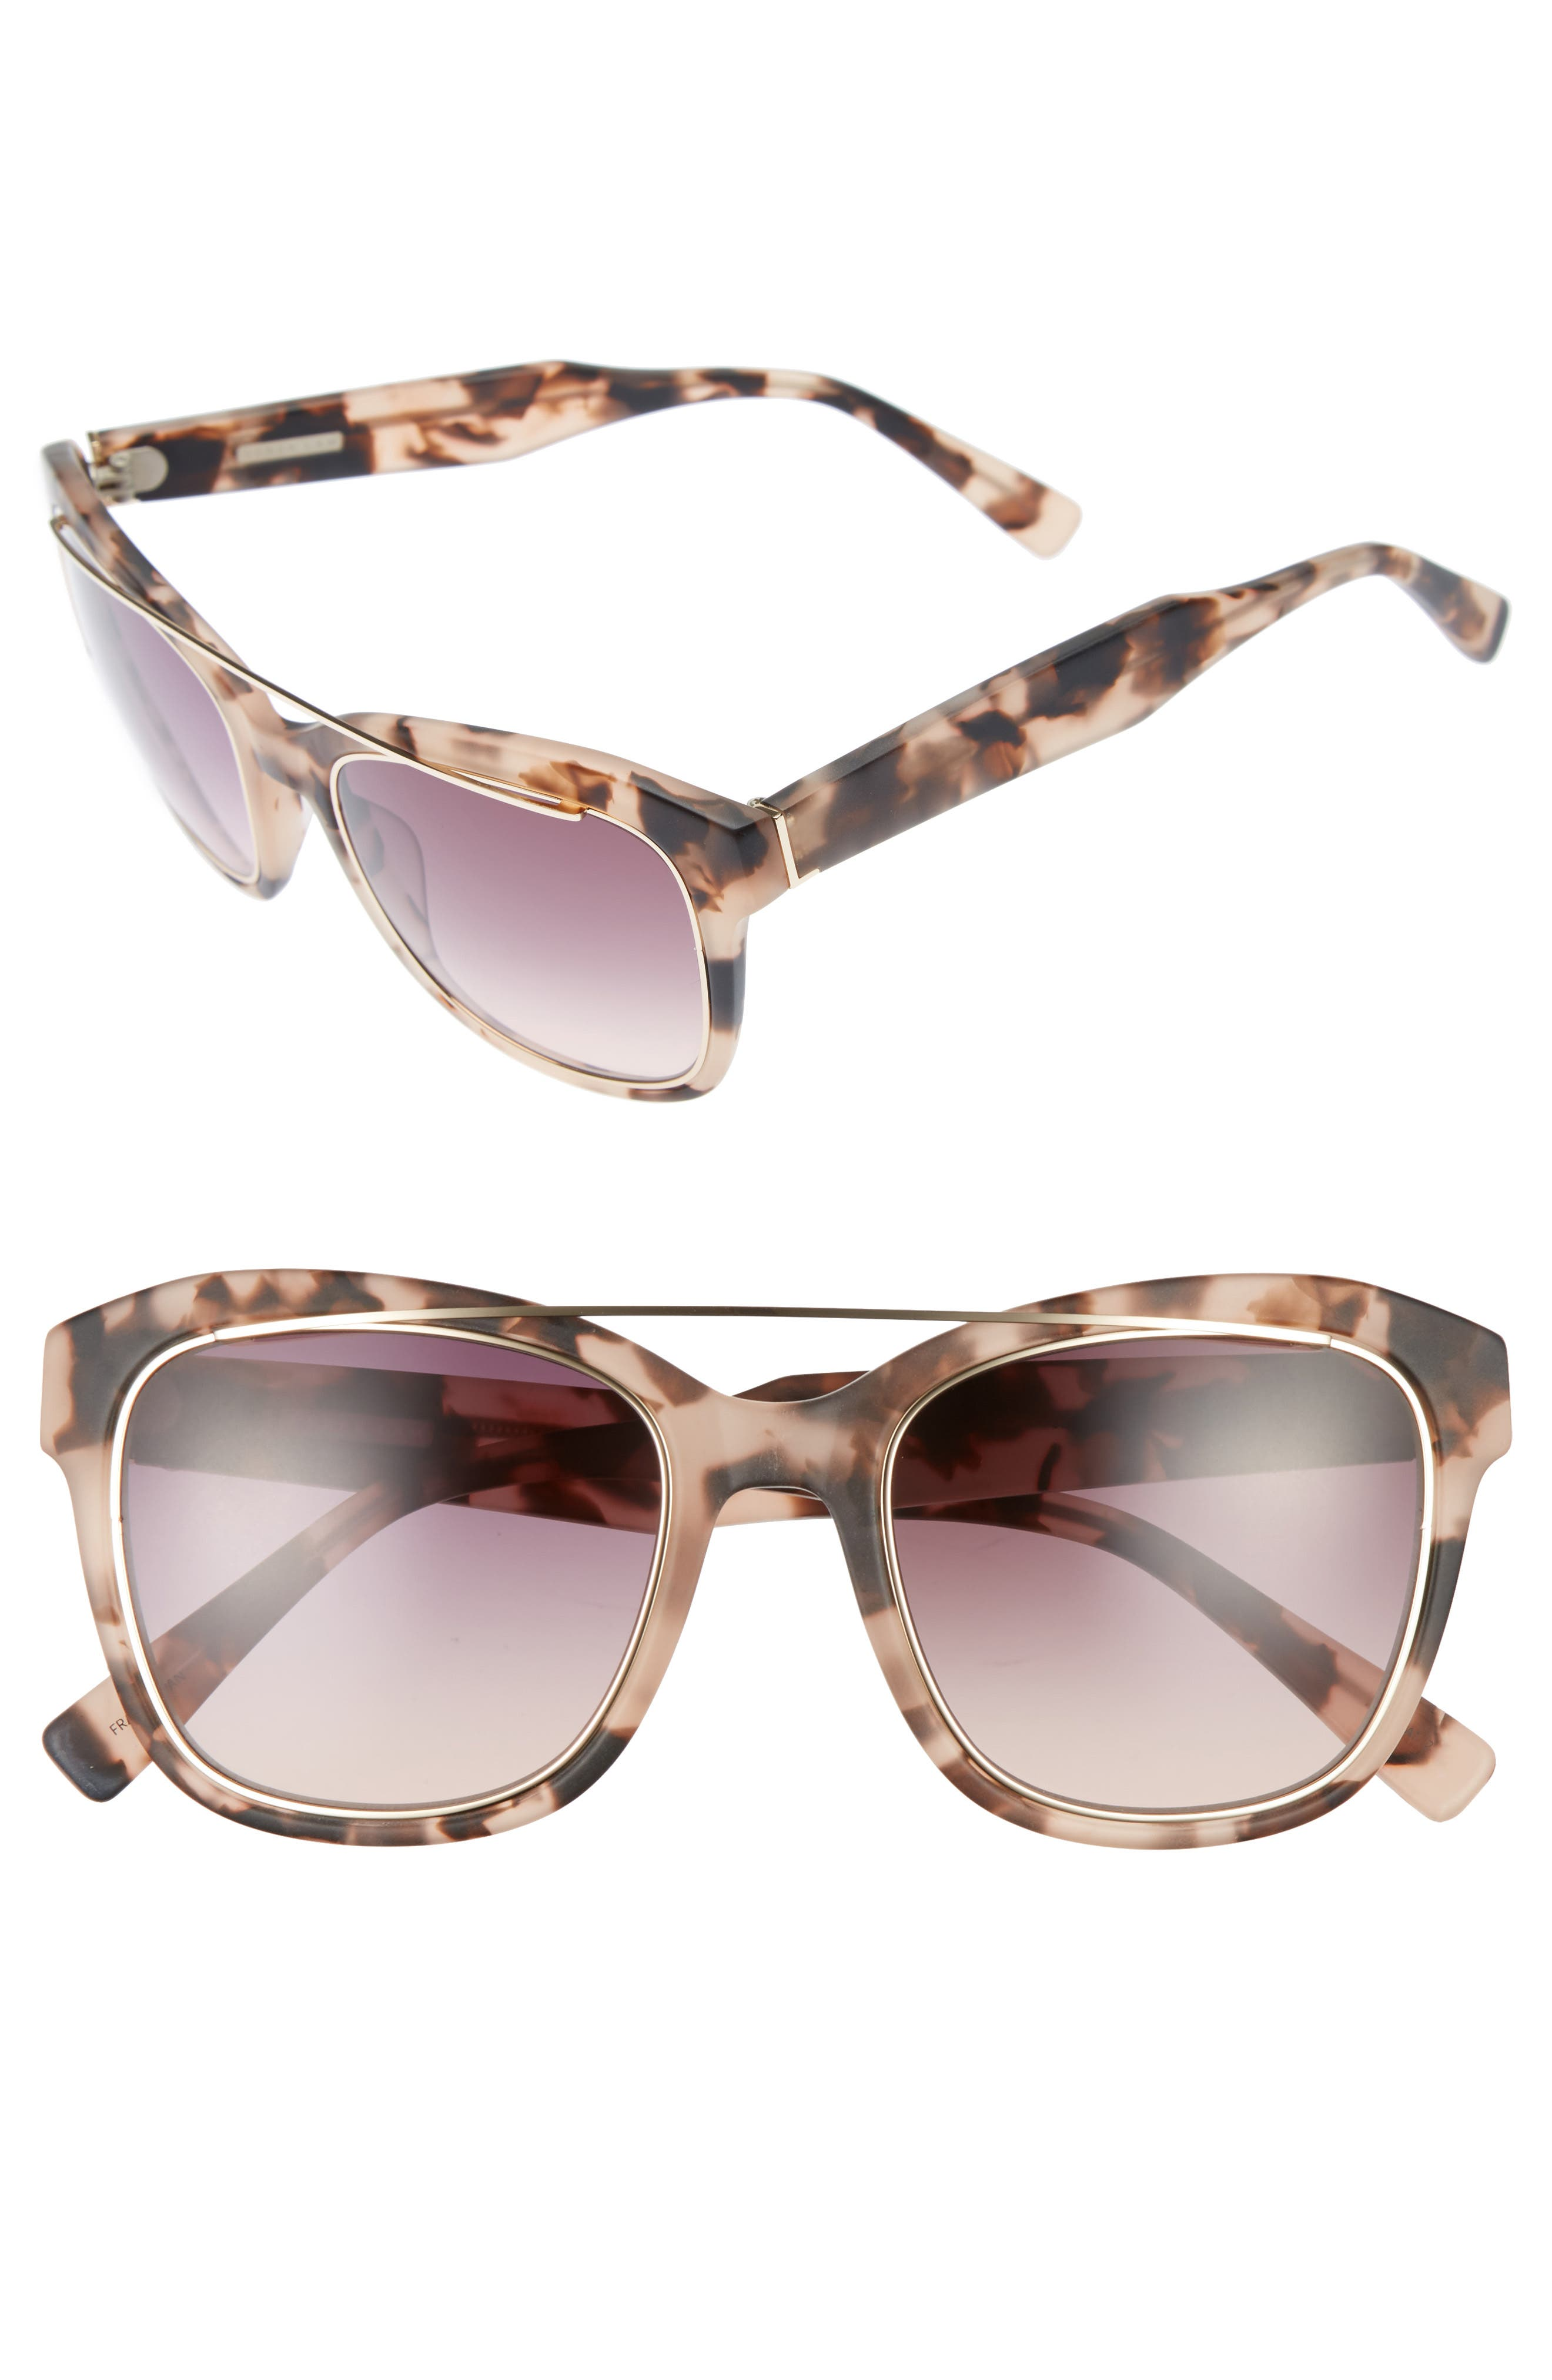 Derek Lam Hudson 52mm Gradient Sunglasses